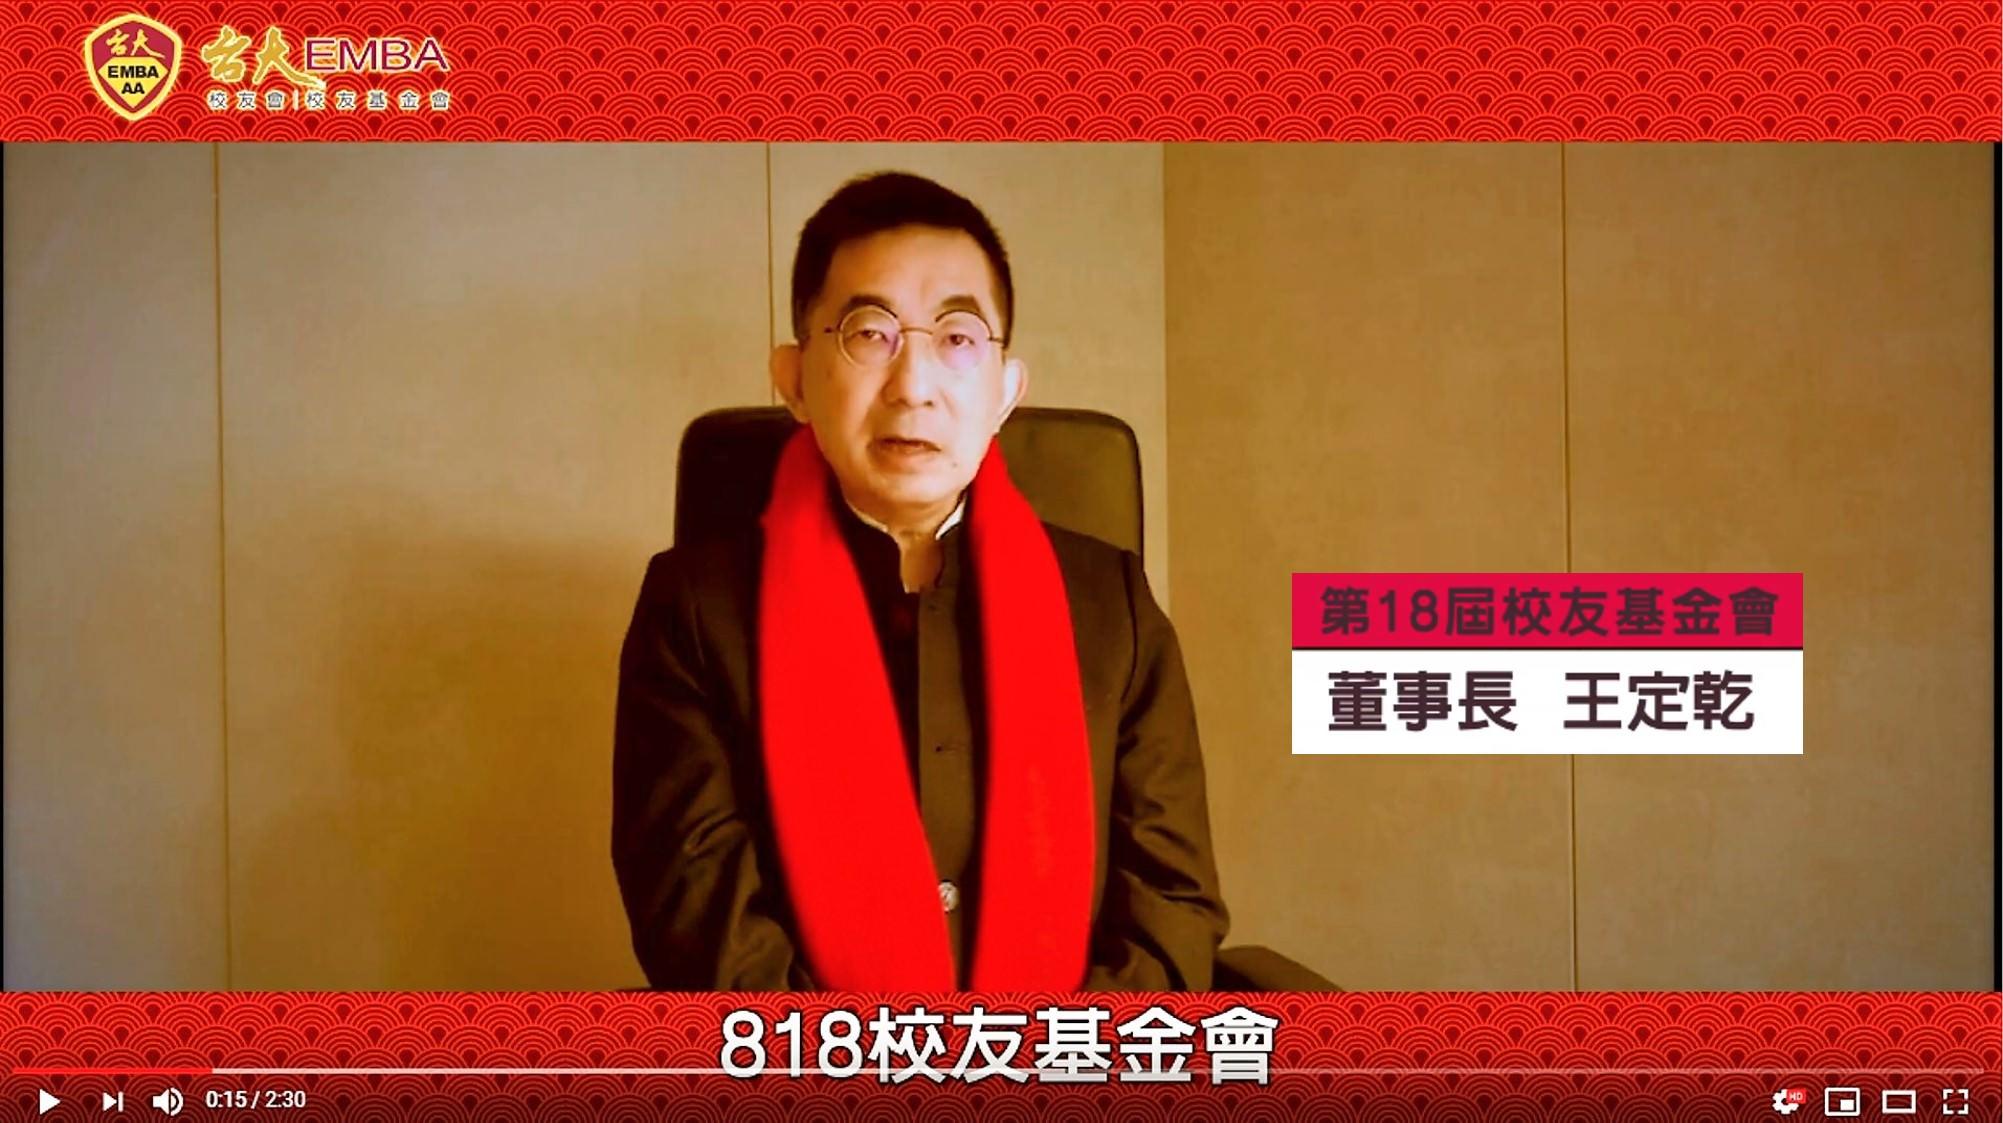 ㊗️第18屆校友基金會 賀年影片